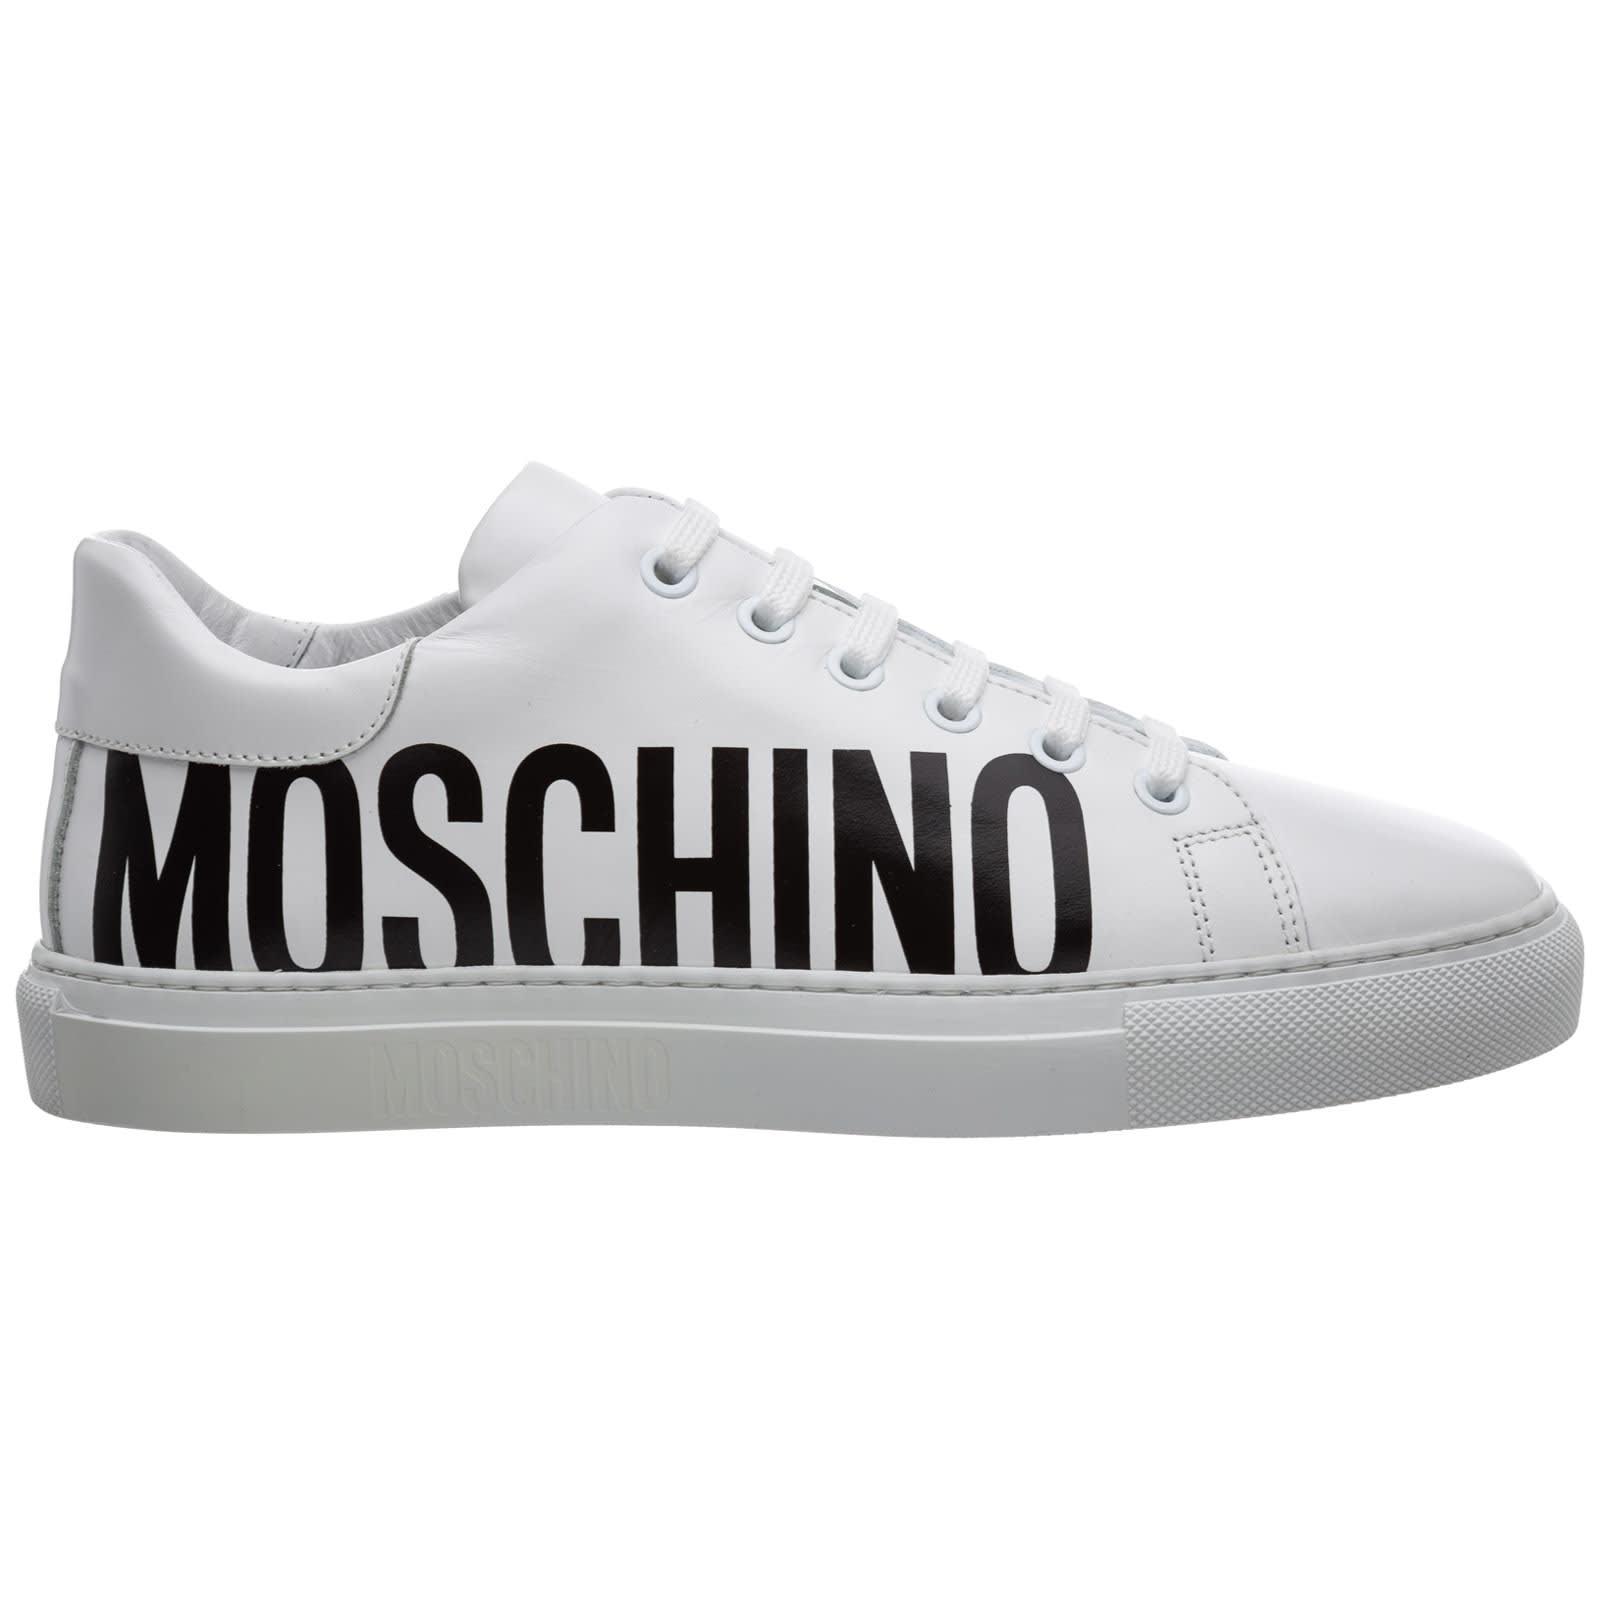 Moschino Serena Sneakers